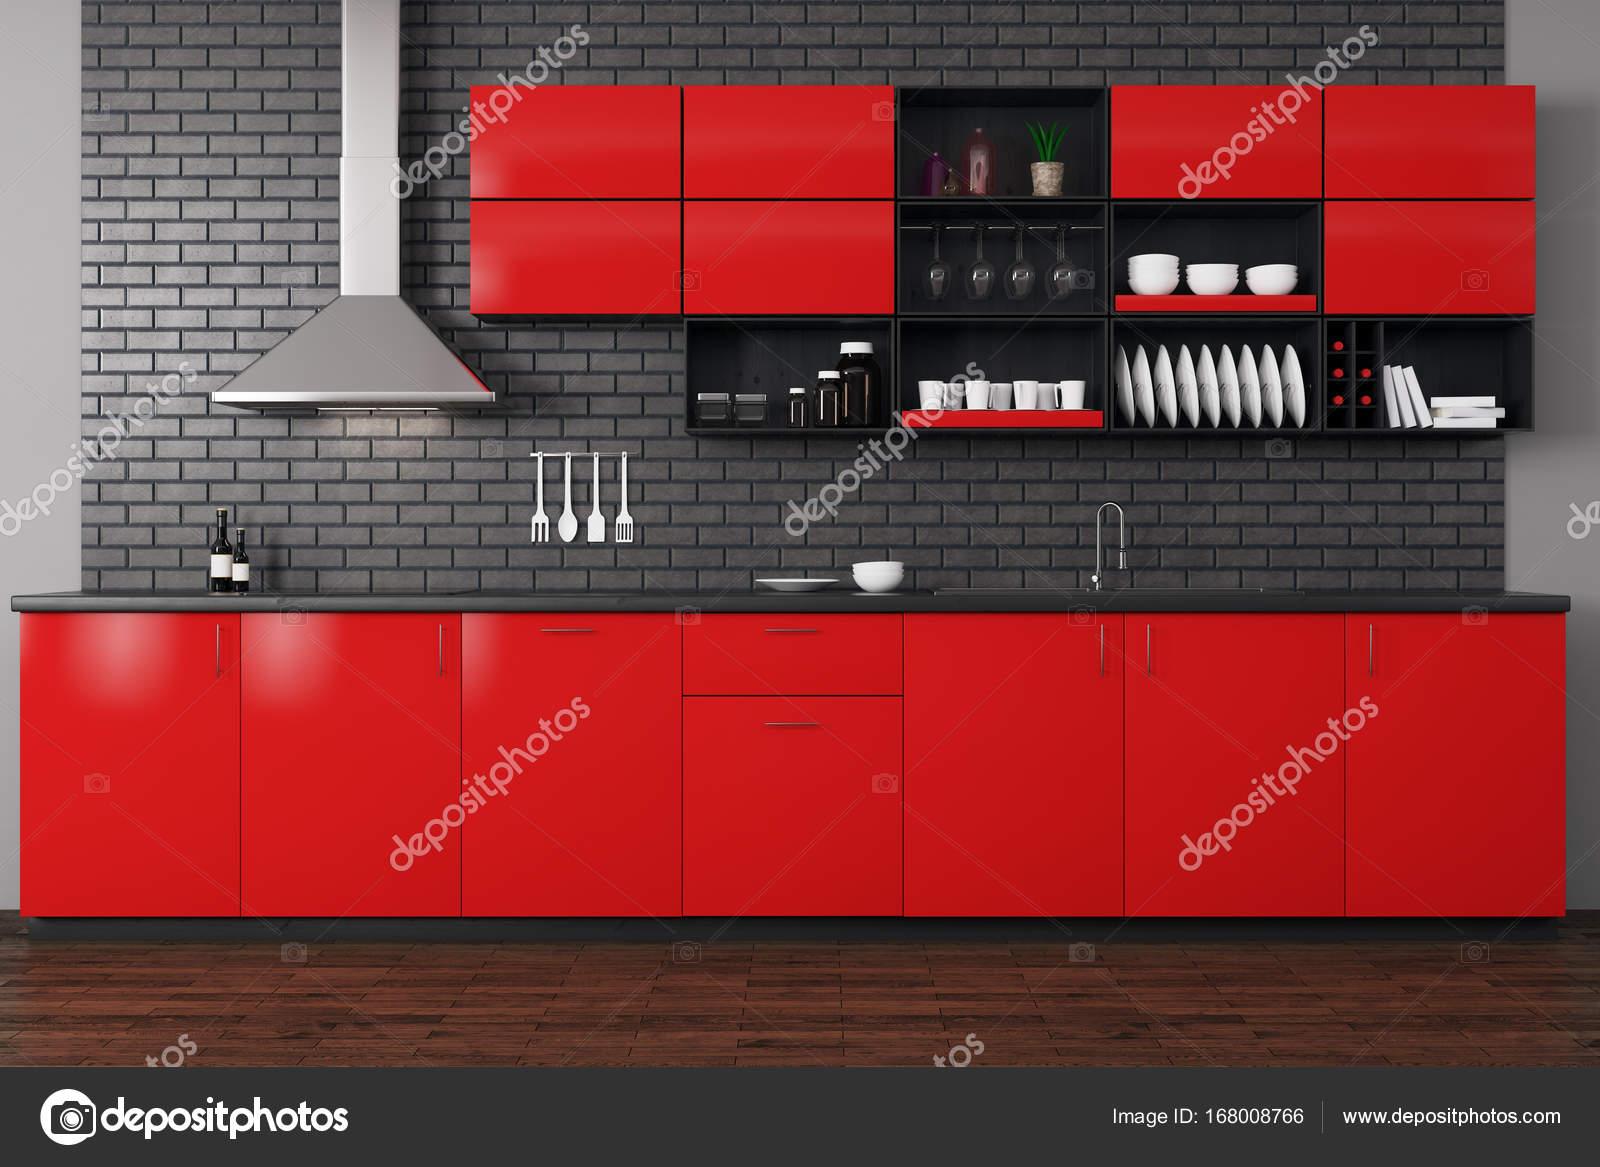 cucina moderna rossa — Foto Stock © peshkova #168008766